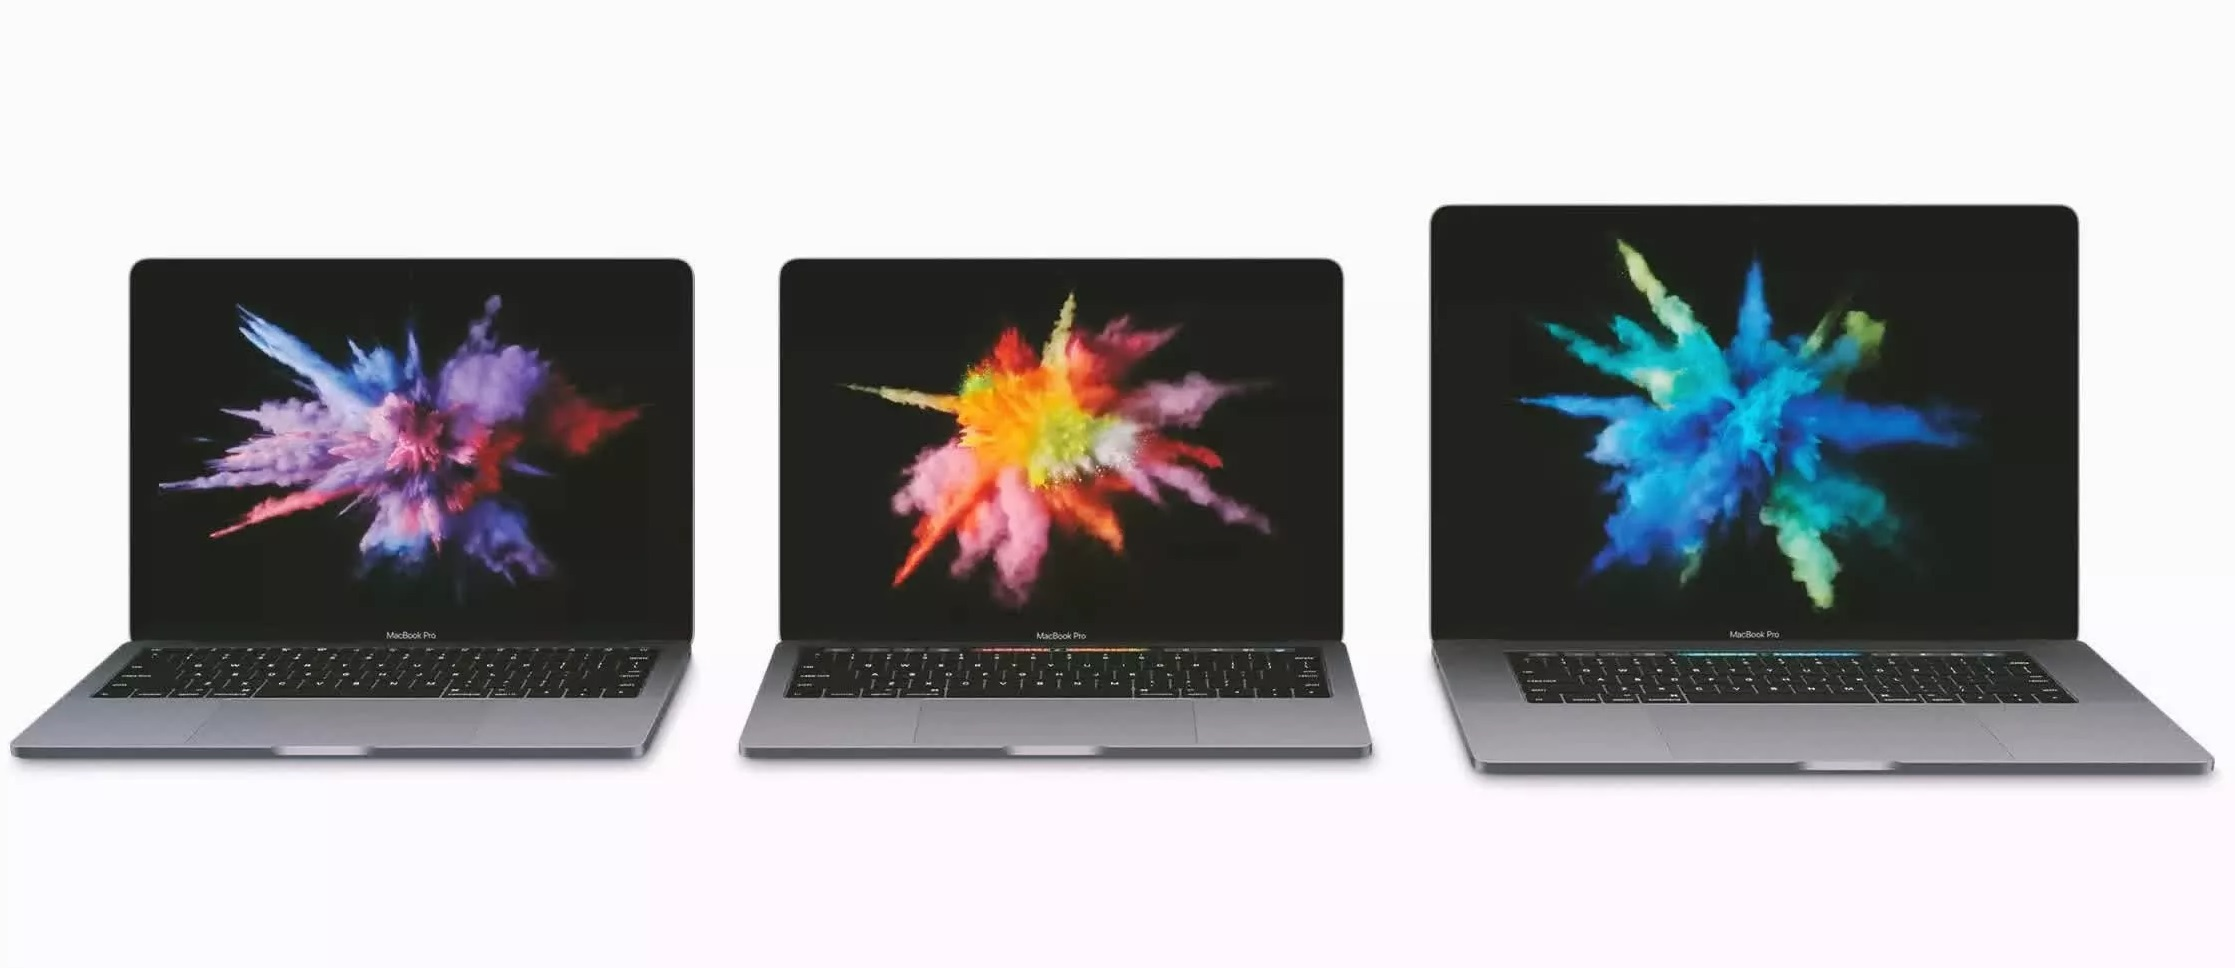 Apple macbook اپل هفته آینده از سه مک بوک جدید با پردازنده اختصاصی رونمایی میکند اخبار IT